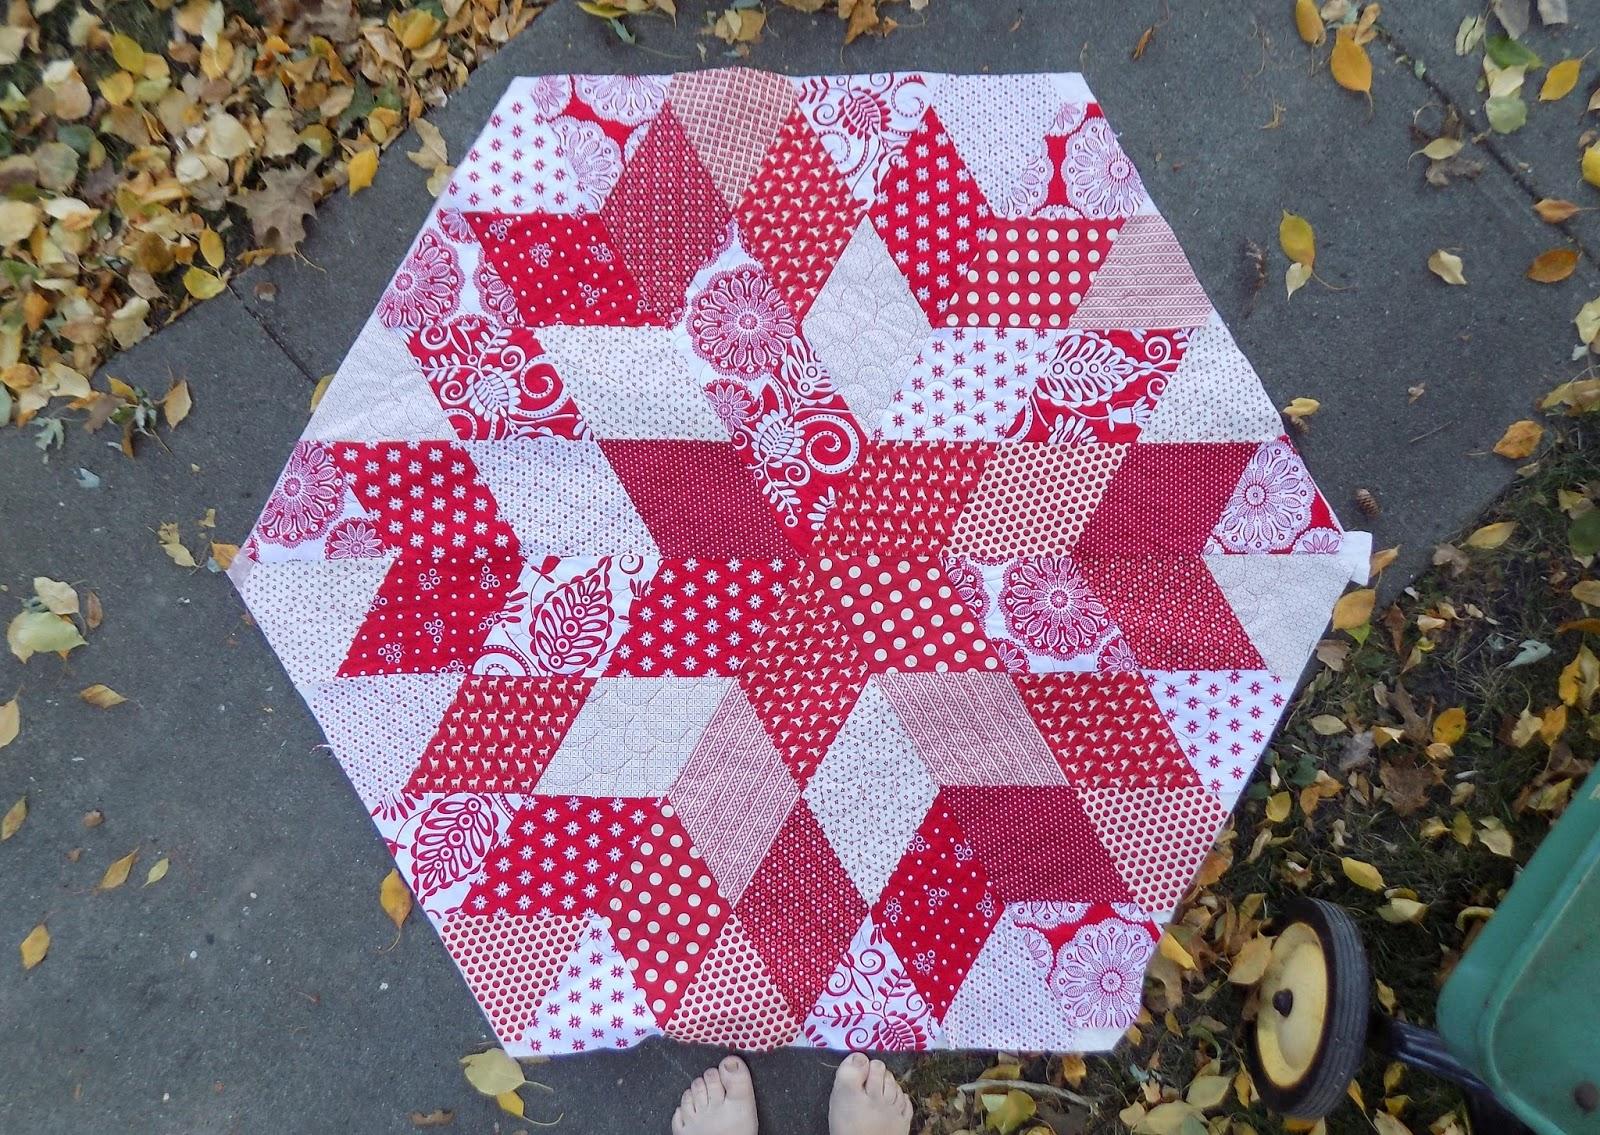 Sewn By Leila Gardunia: Hexagonal Christmas Tree Skirt